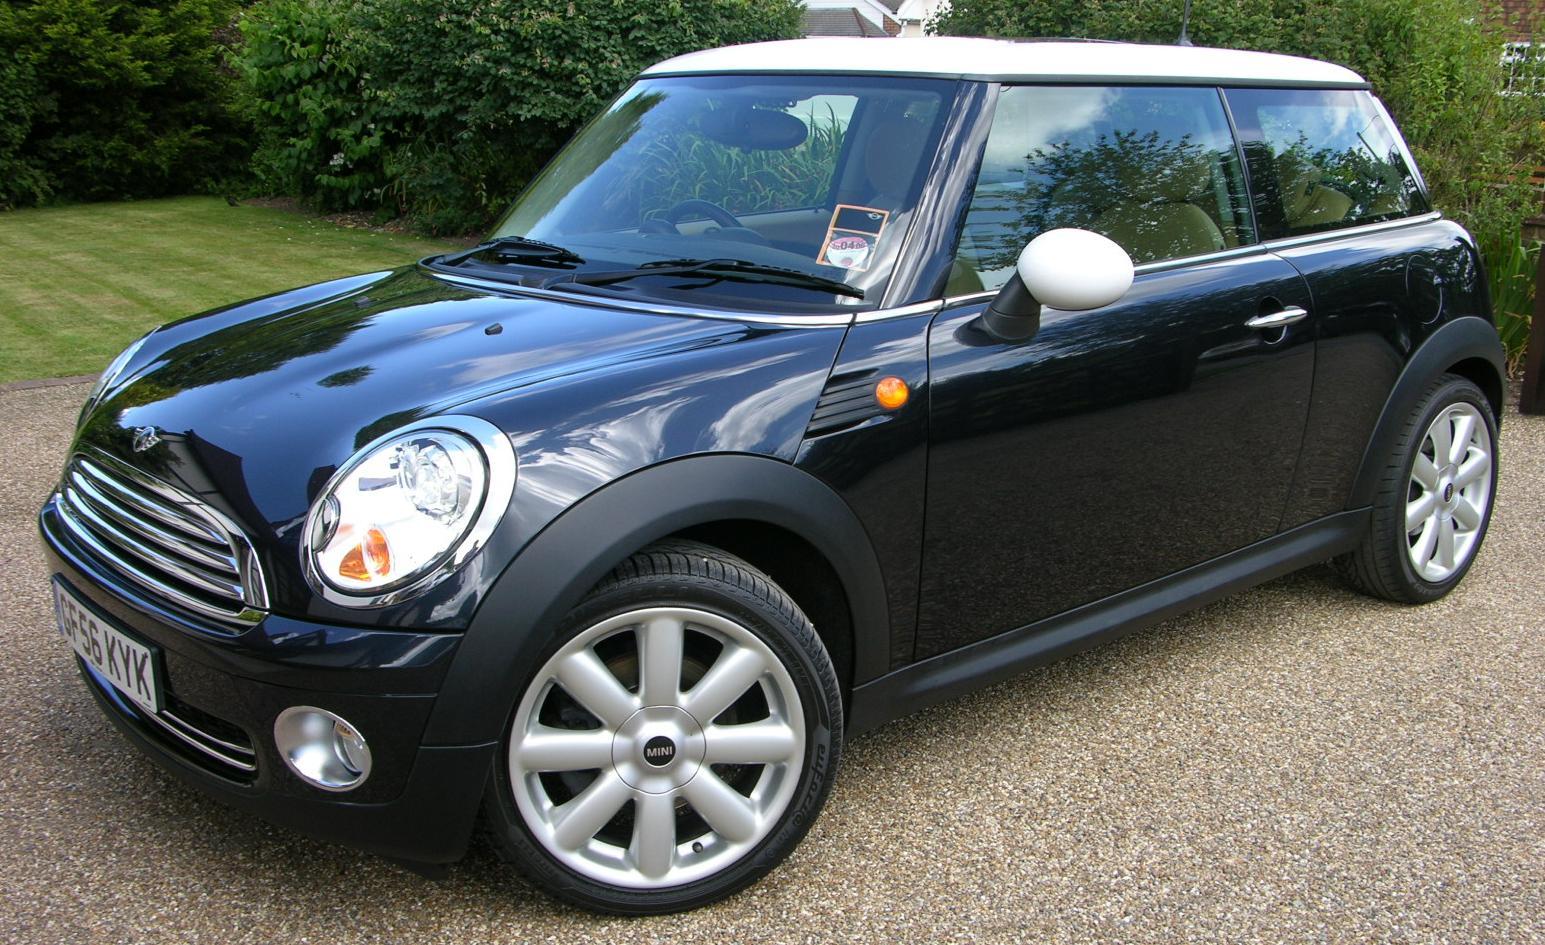 Mini Cooper Car Covers For Sale